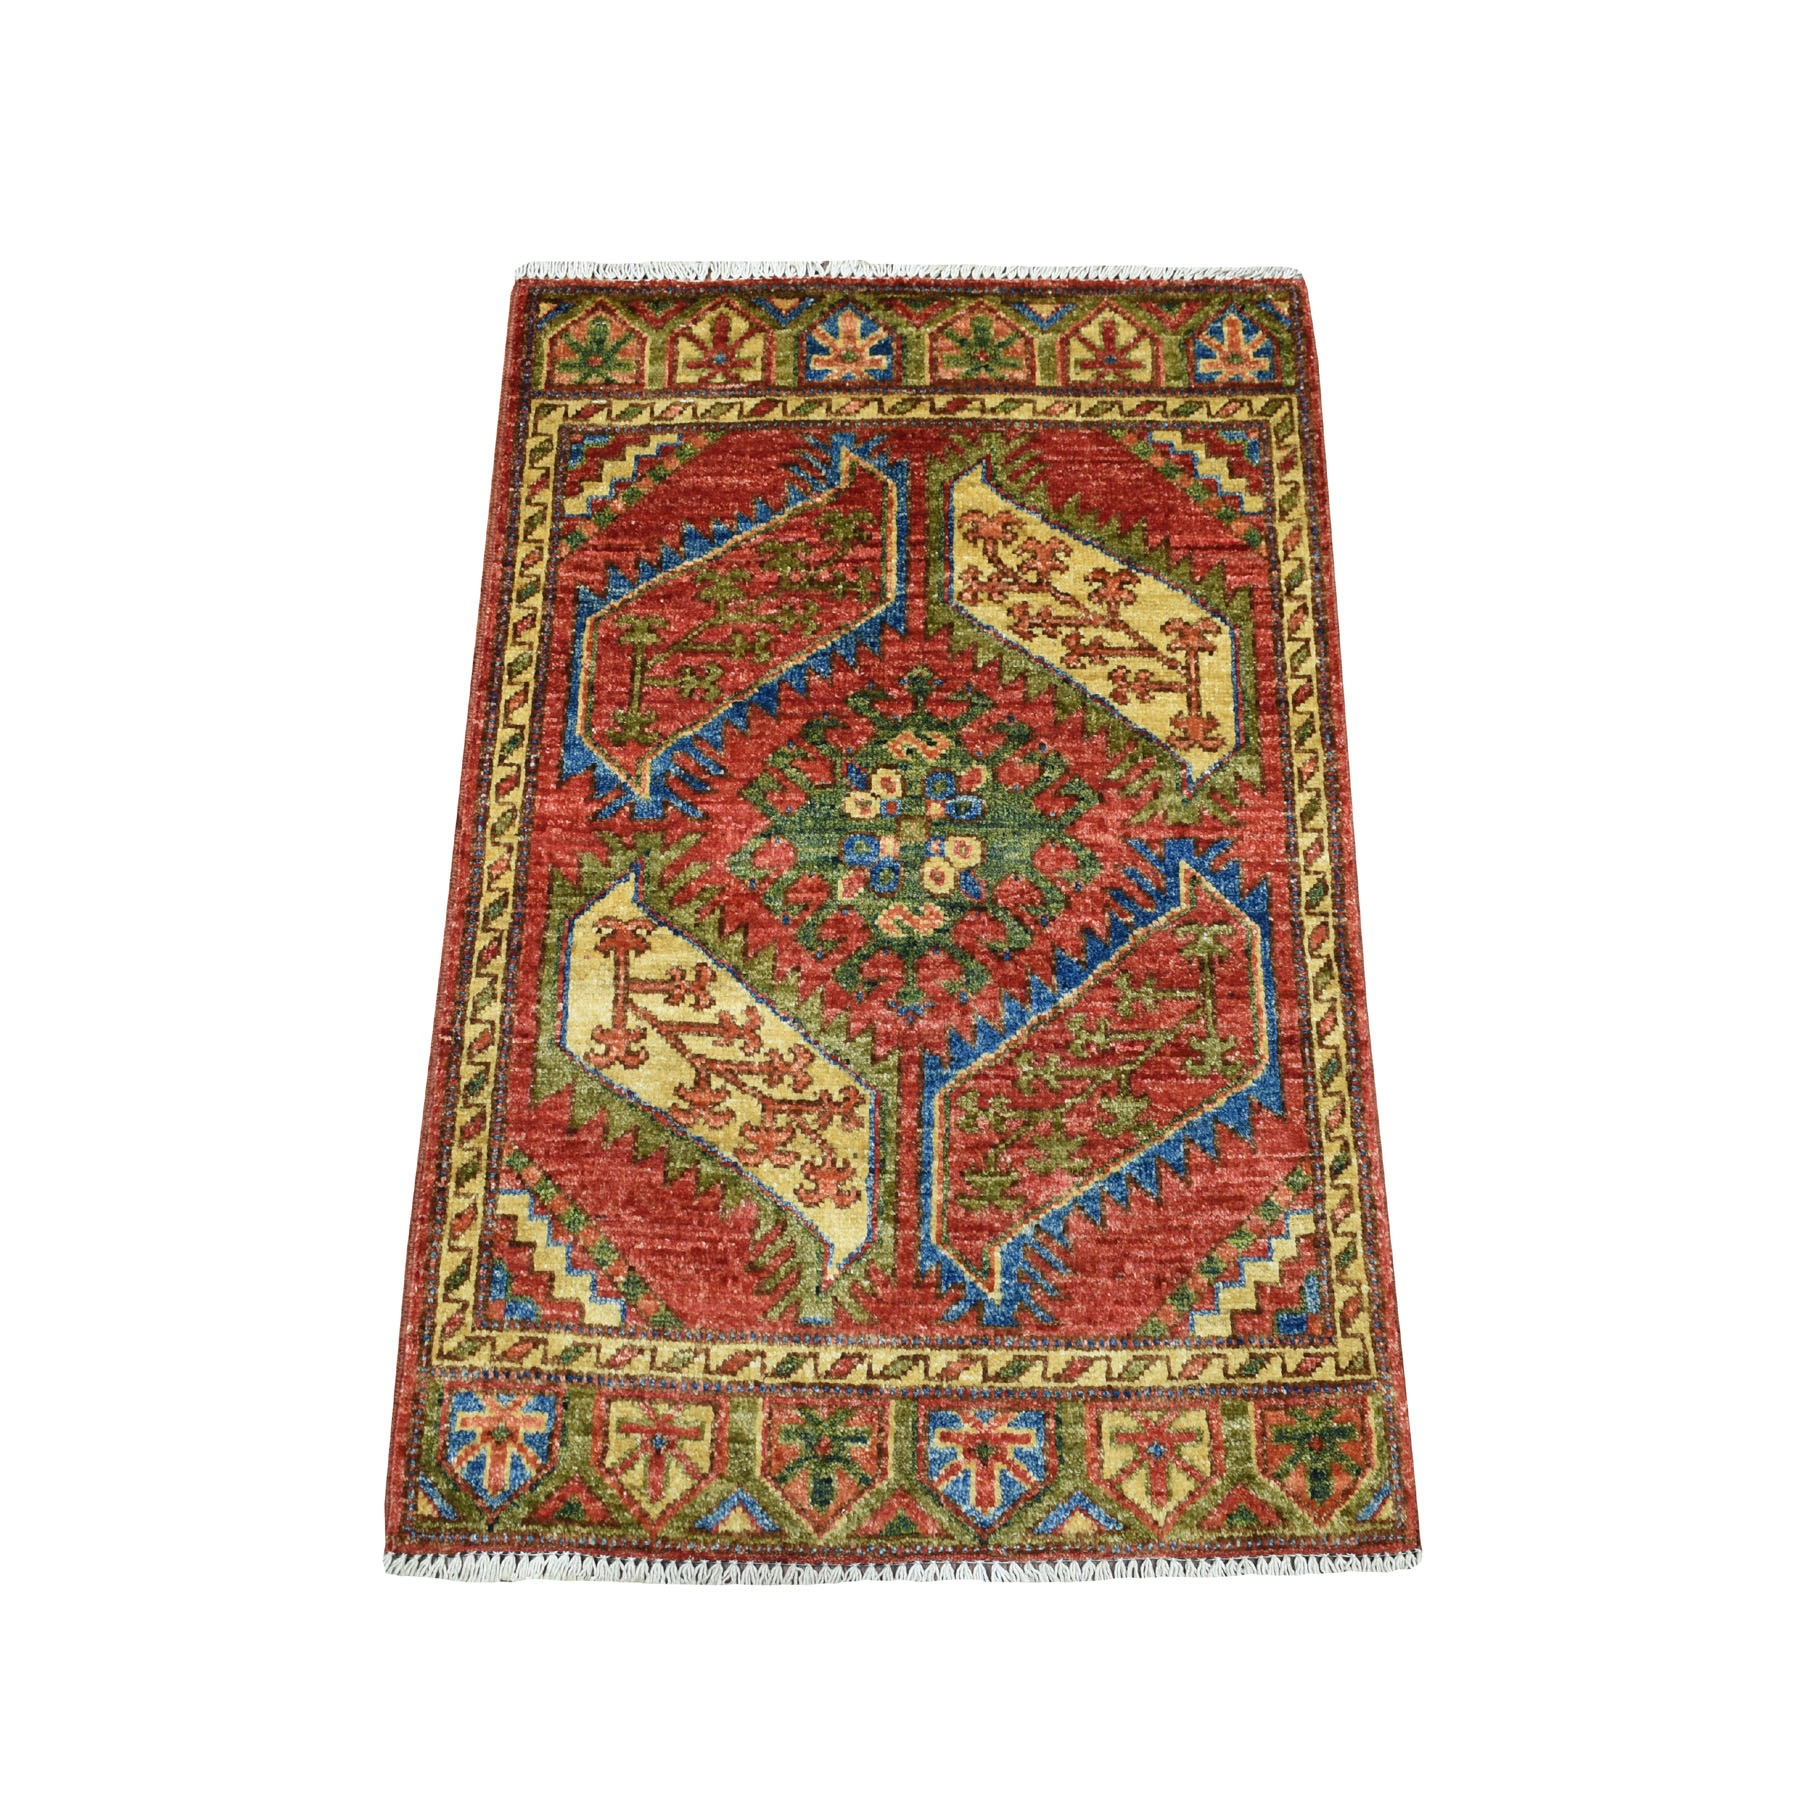 2'x3' Afghan Ersari Tribal Design Pure Wool Hand Knotted Oriental Rug 53430